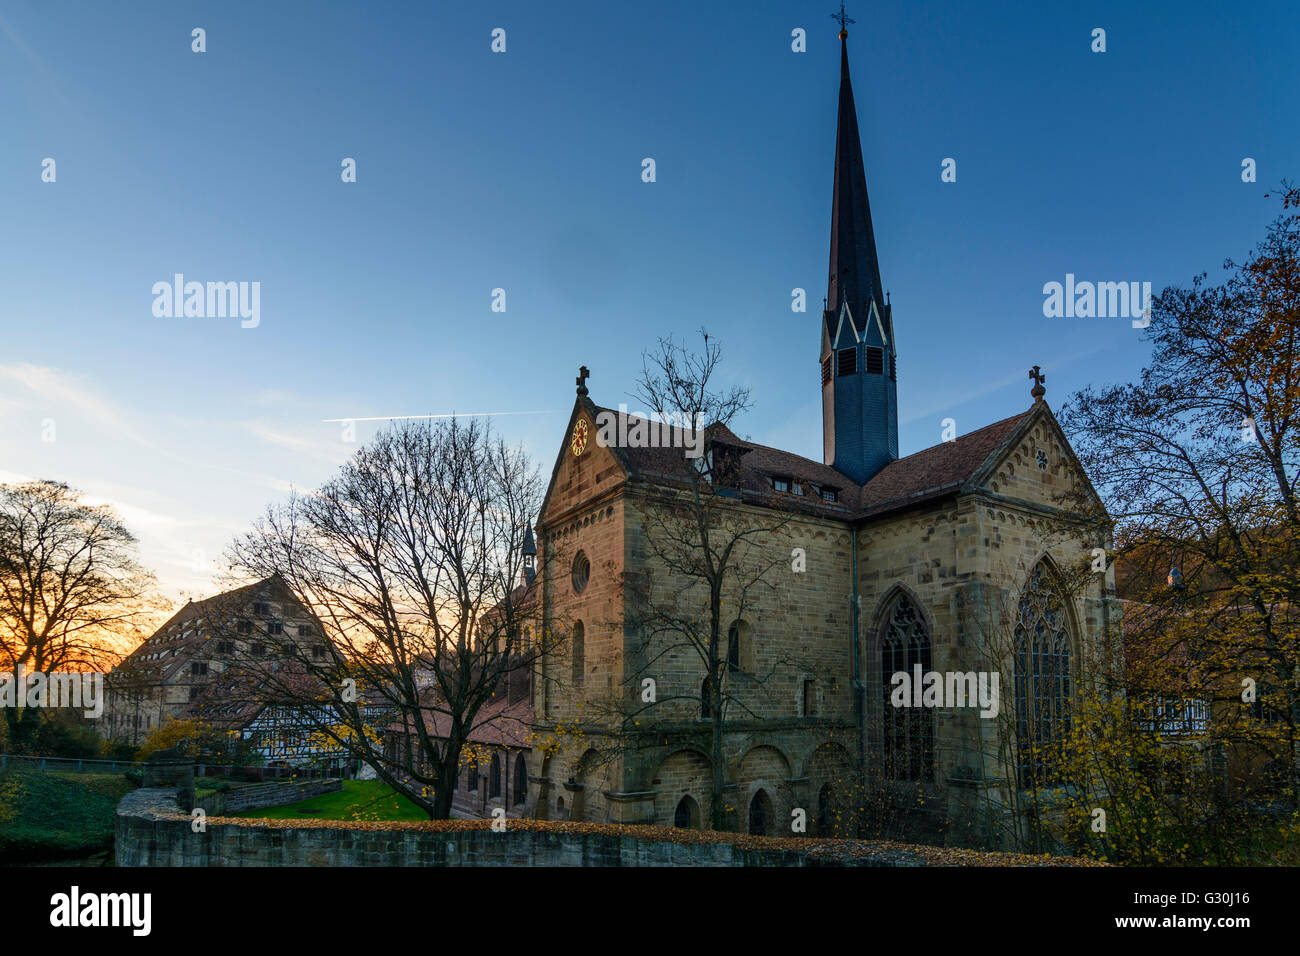 Maulbronn Monastery : church Klosterkirche, Germany, Baden-Württemberg, Kraichgau-Stromberg, Maulbronn - Stock Image